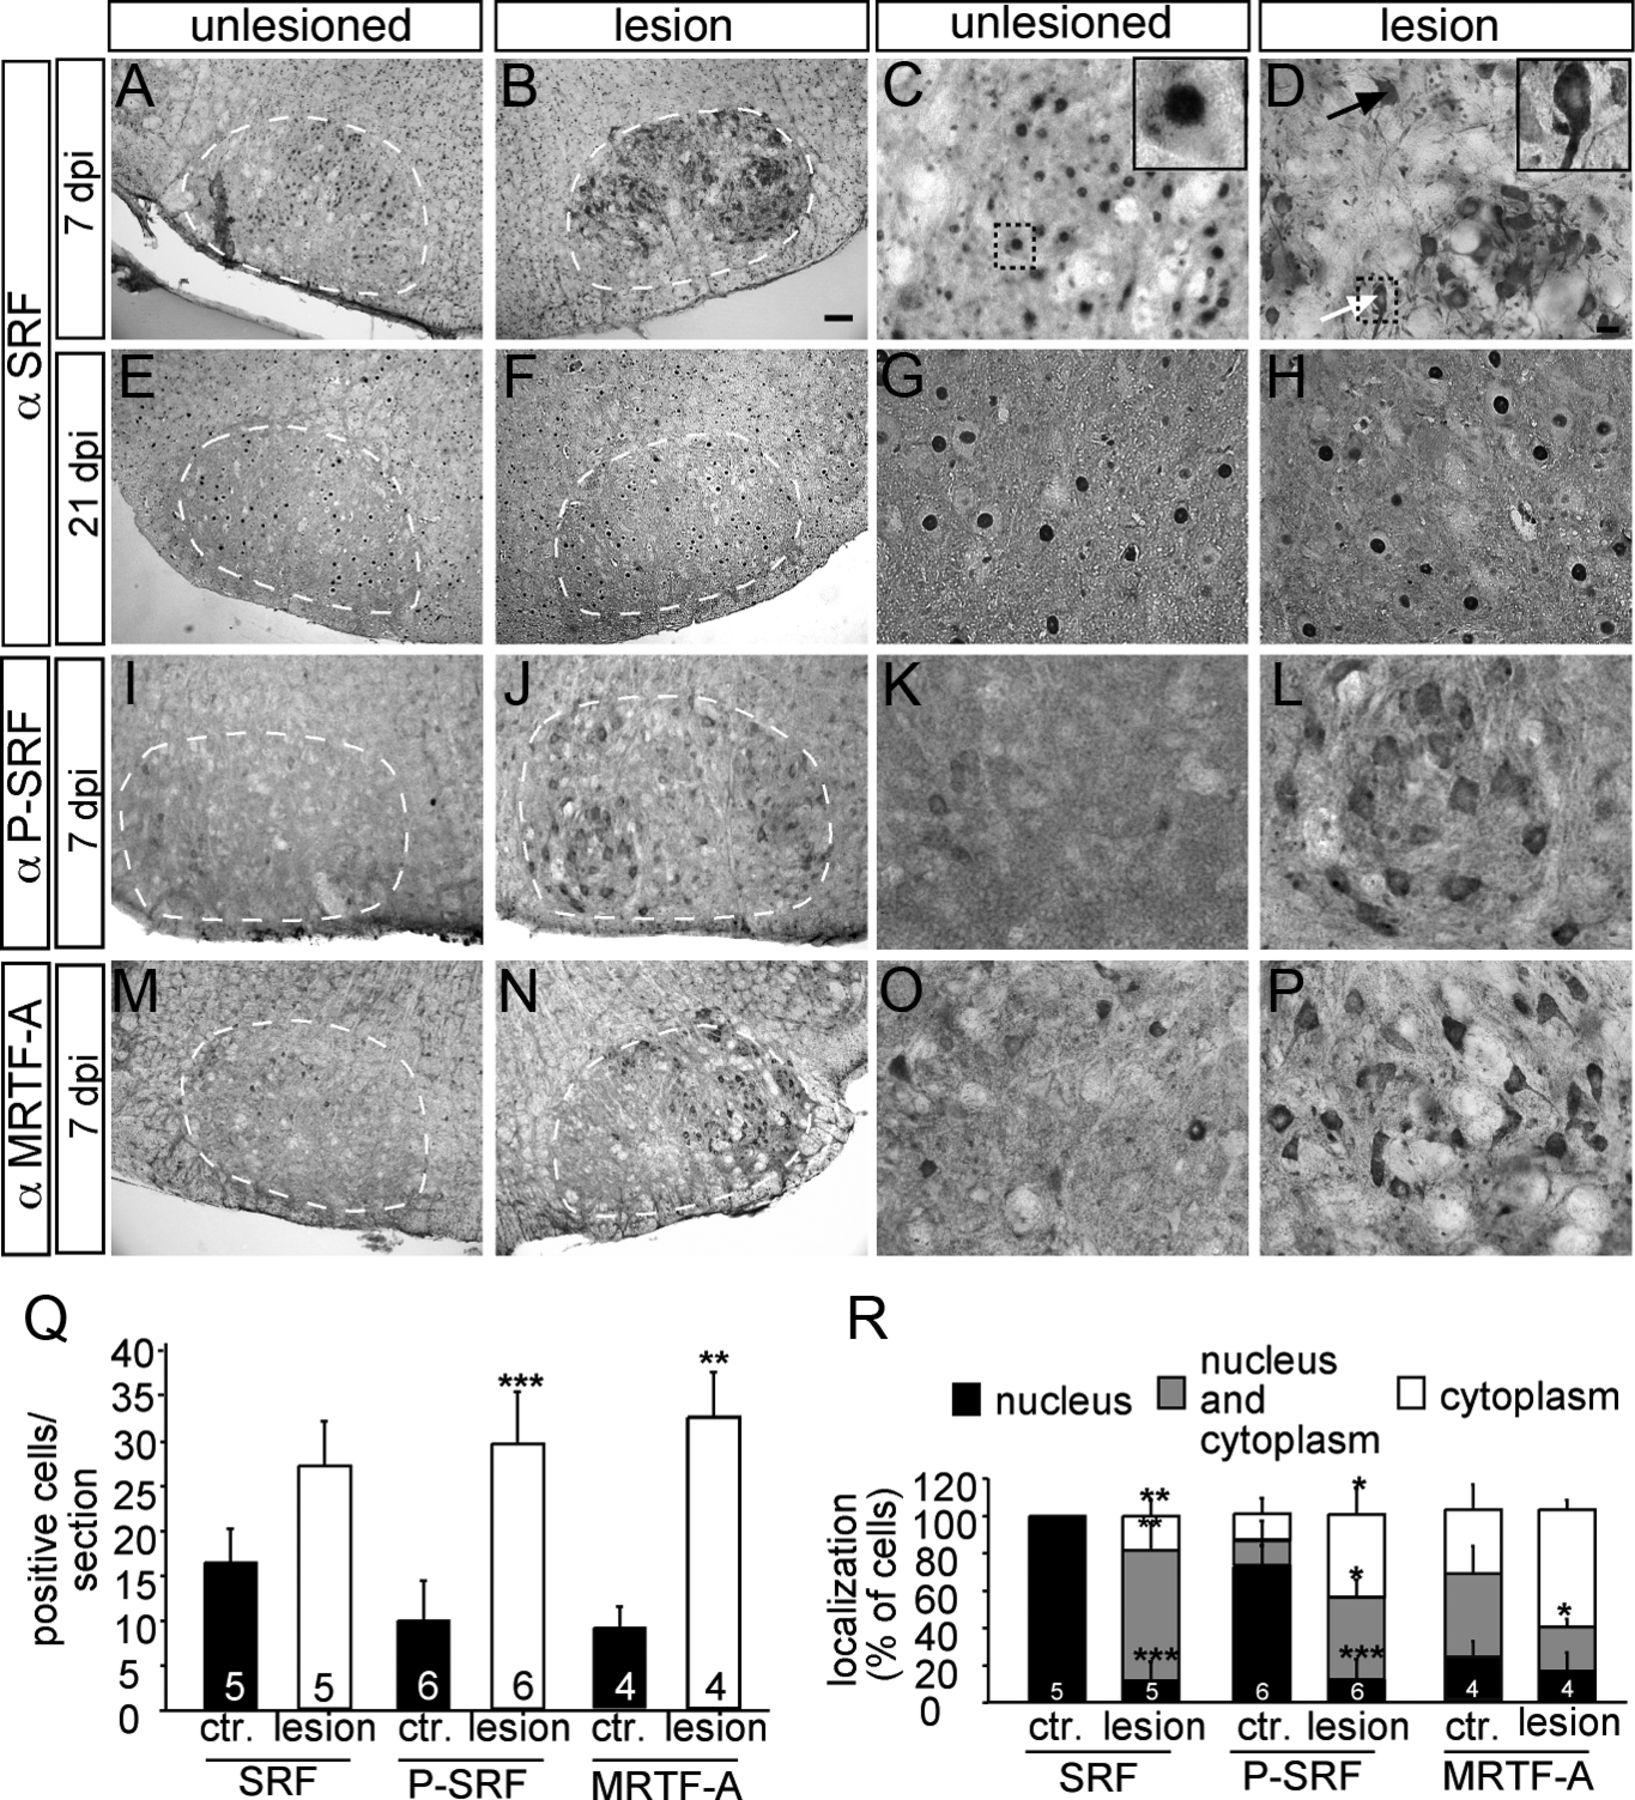 The Transcription Factor Serum Response Factor Stimulates Axon